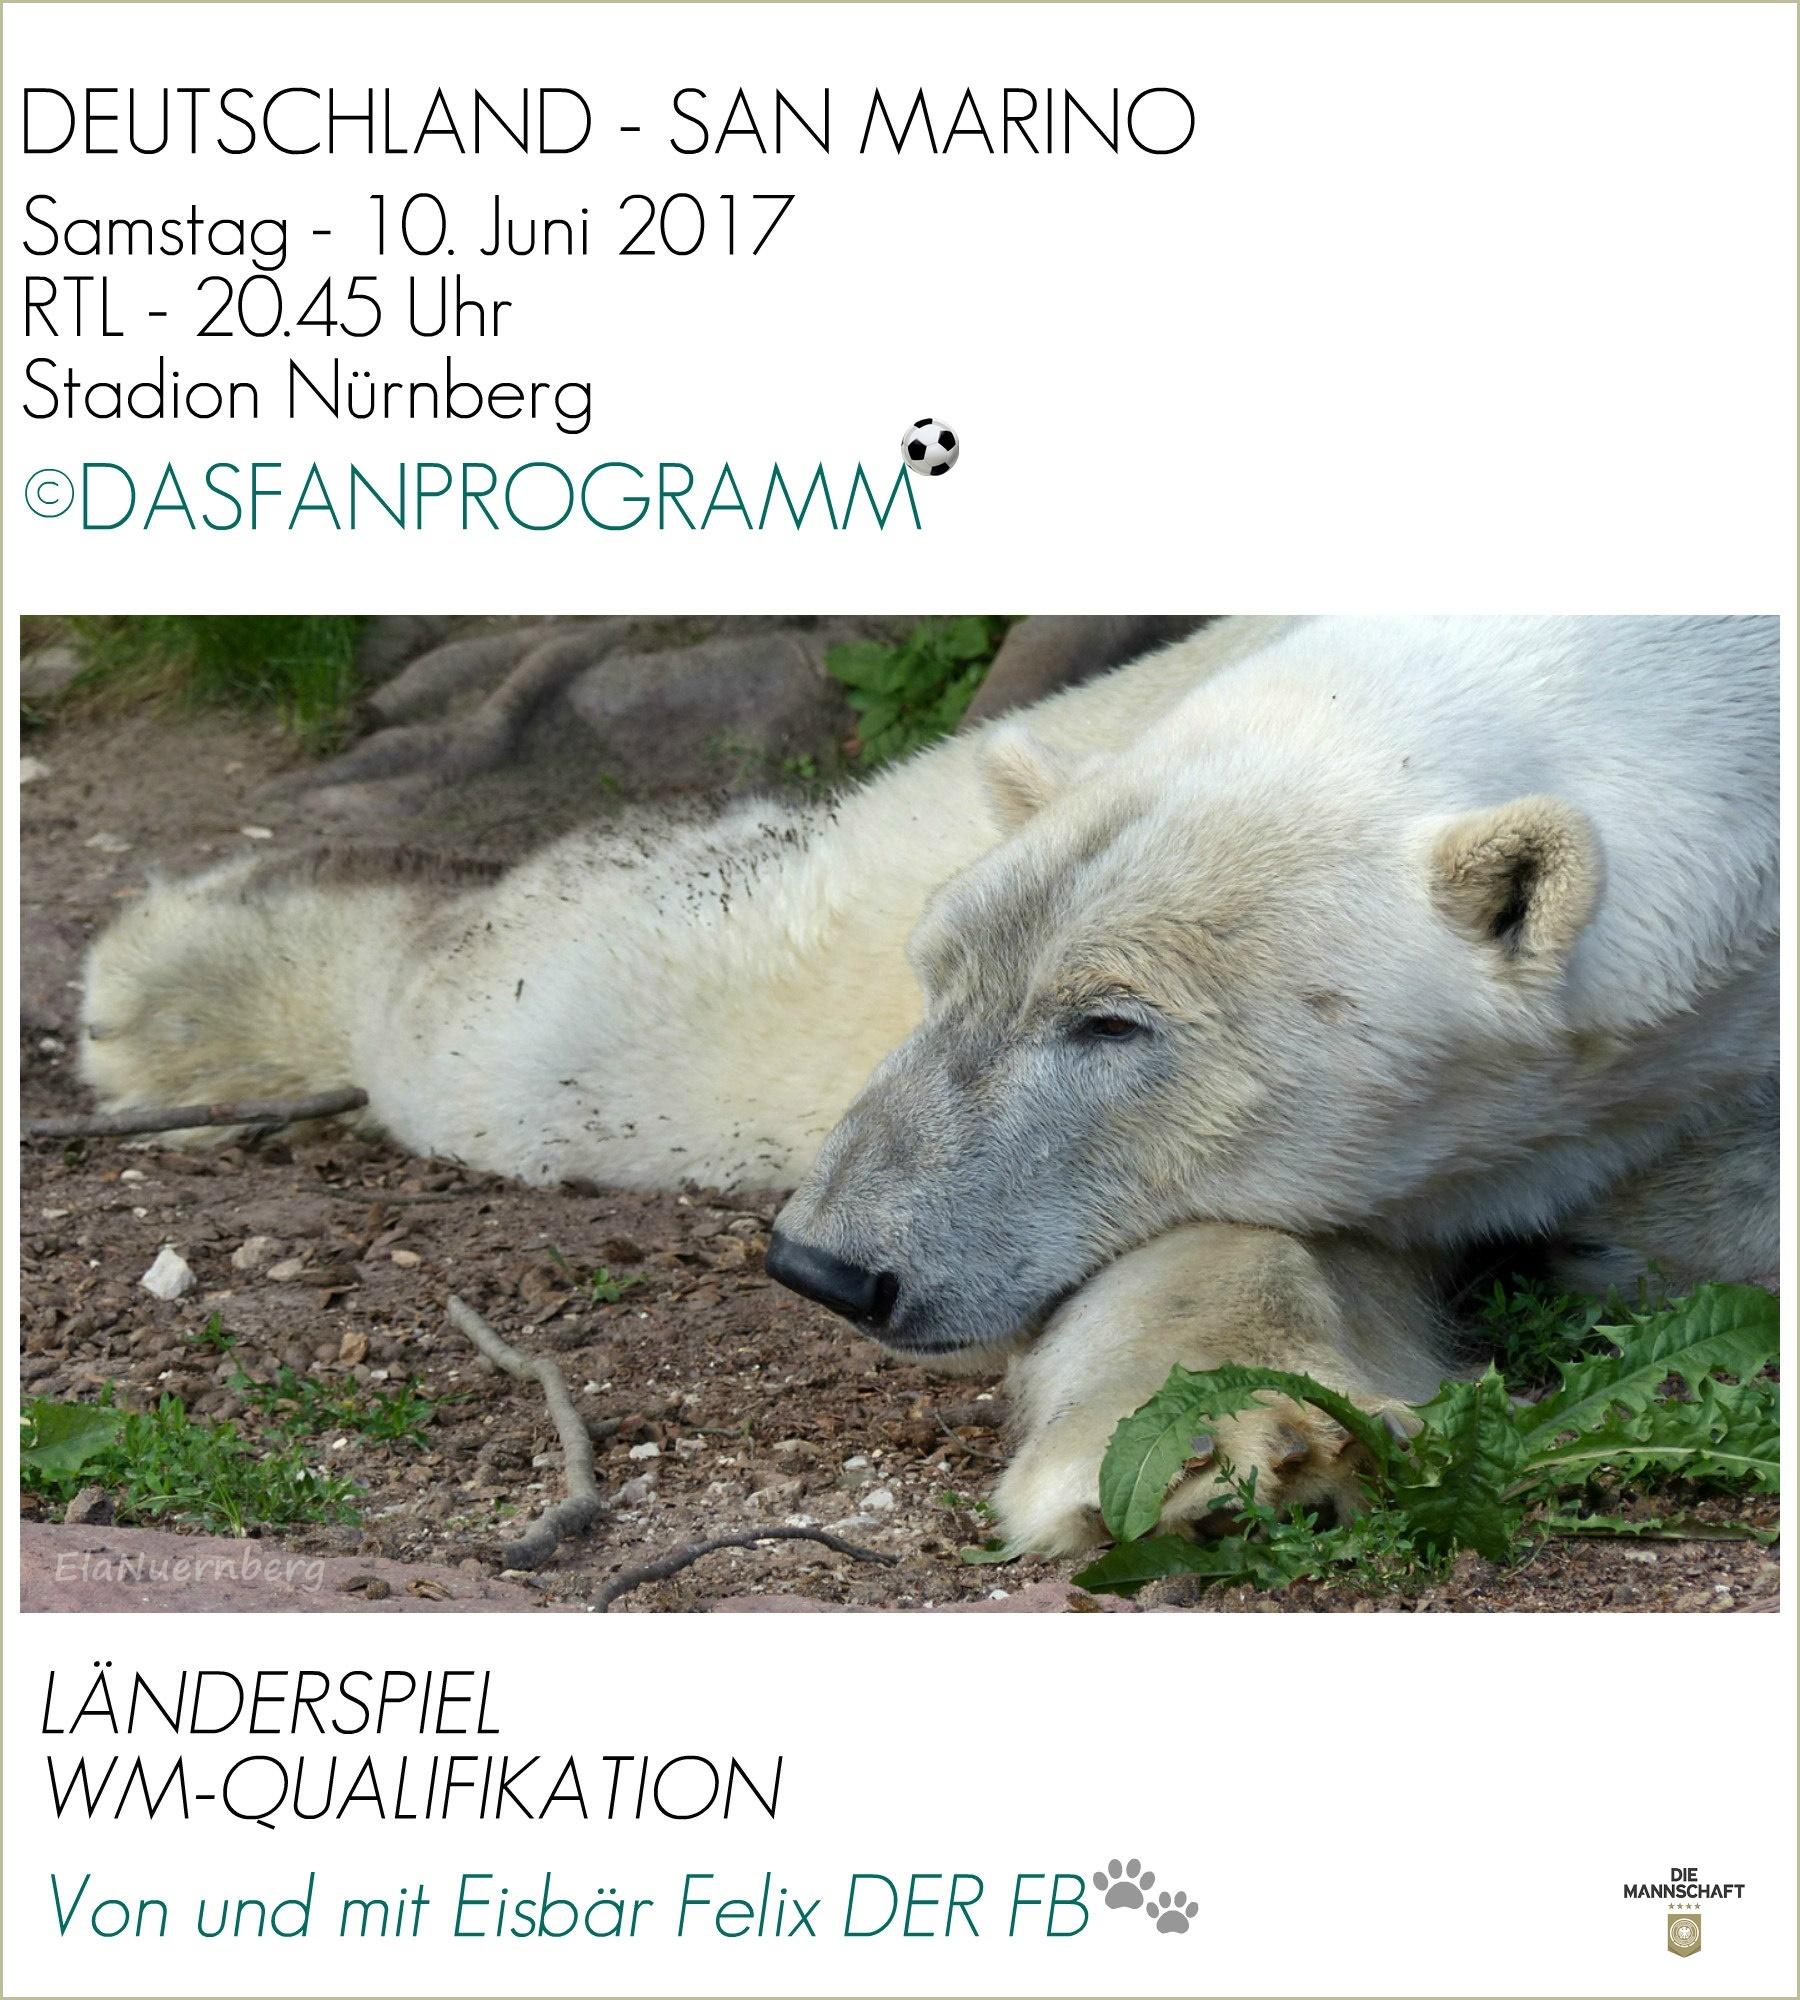 Eisbär Felix DER FanBeauftragte im Tiergarten Nürnberg